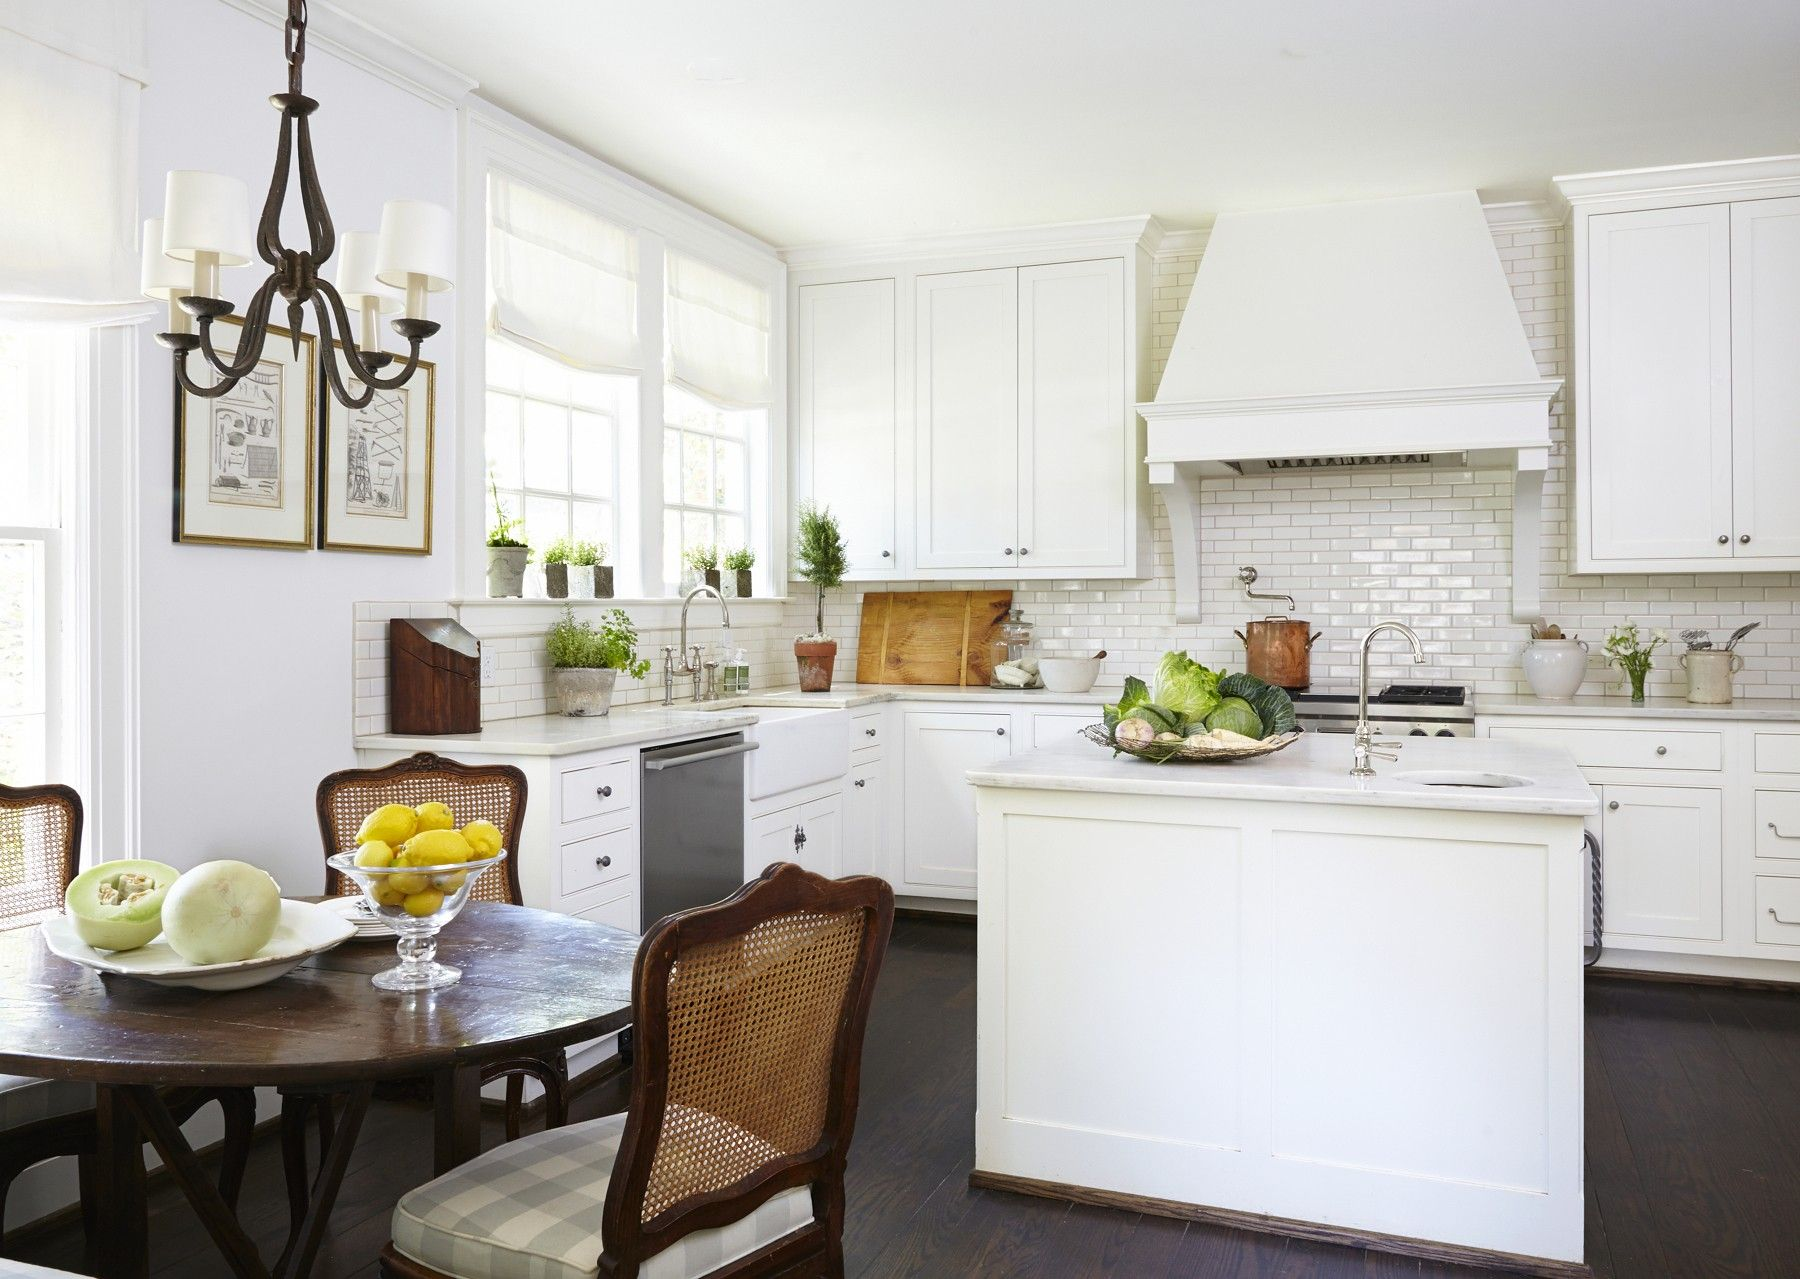 kitchen remodeling montgomery al Interior Designer Crush Iris Thorpe The kitchen remodel